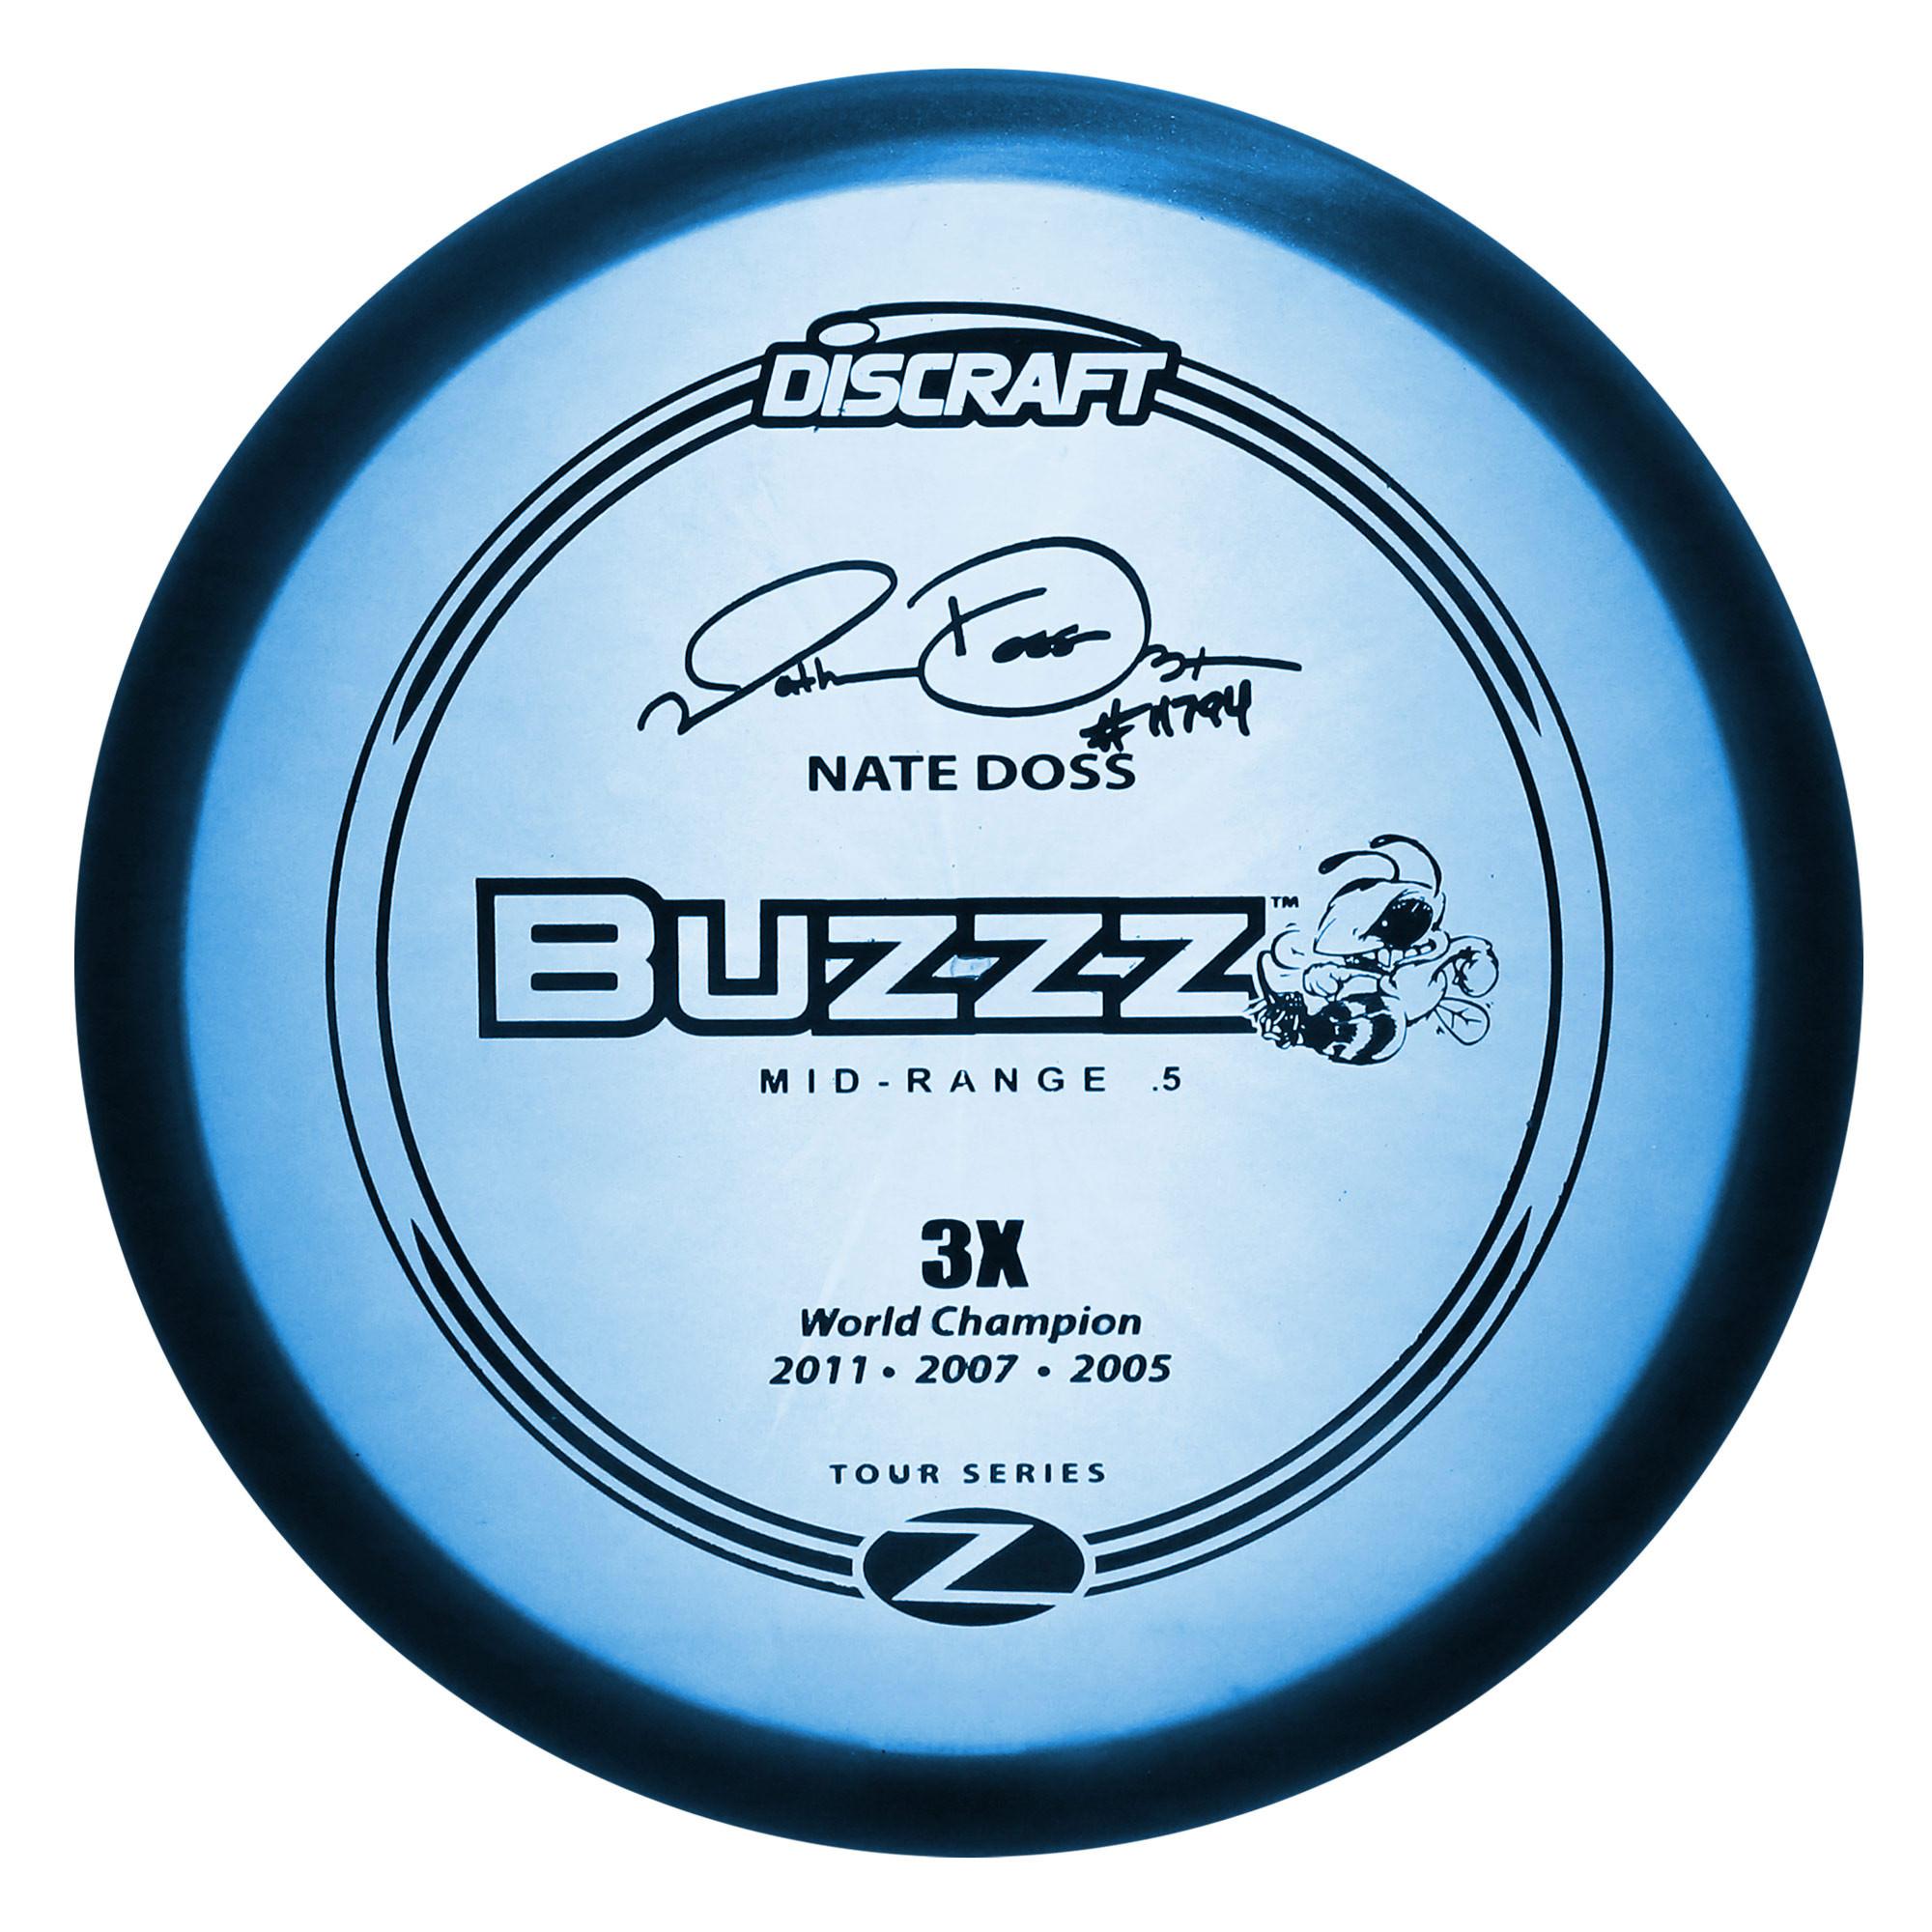 Discraft Elite Z Buzzz Nate Doss Tour Series